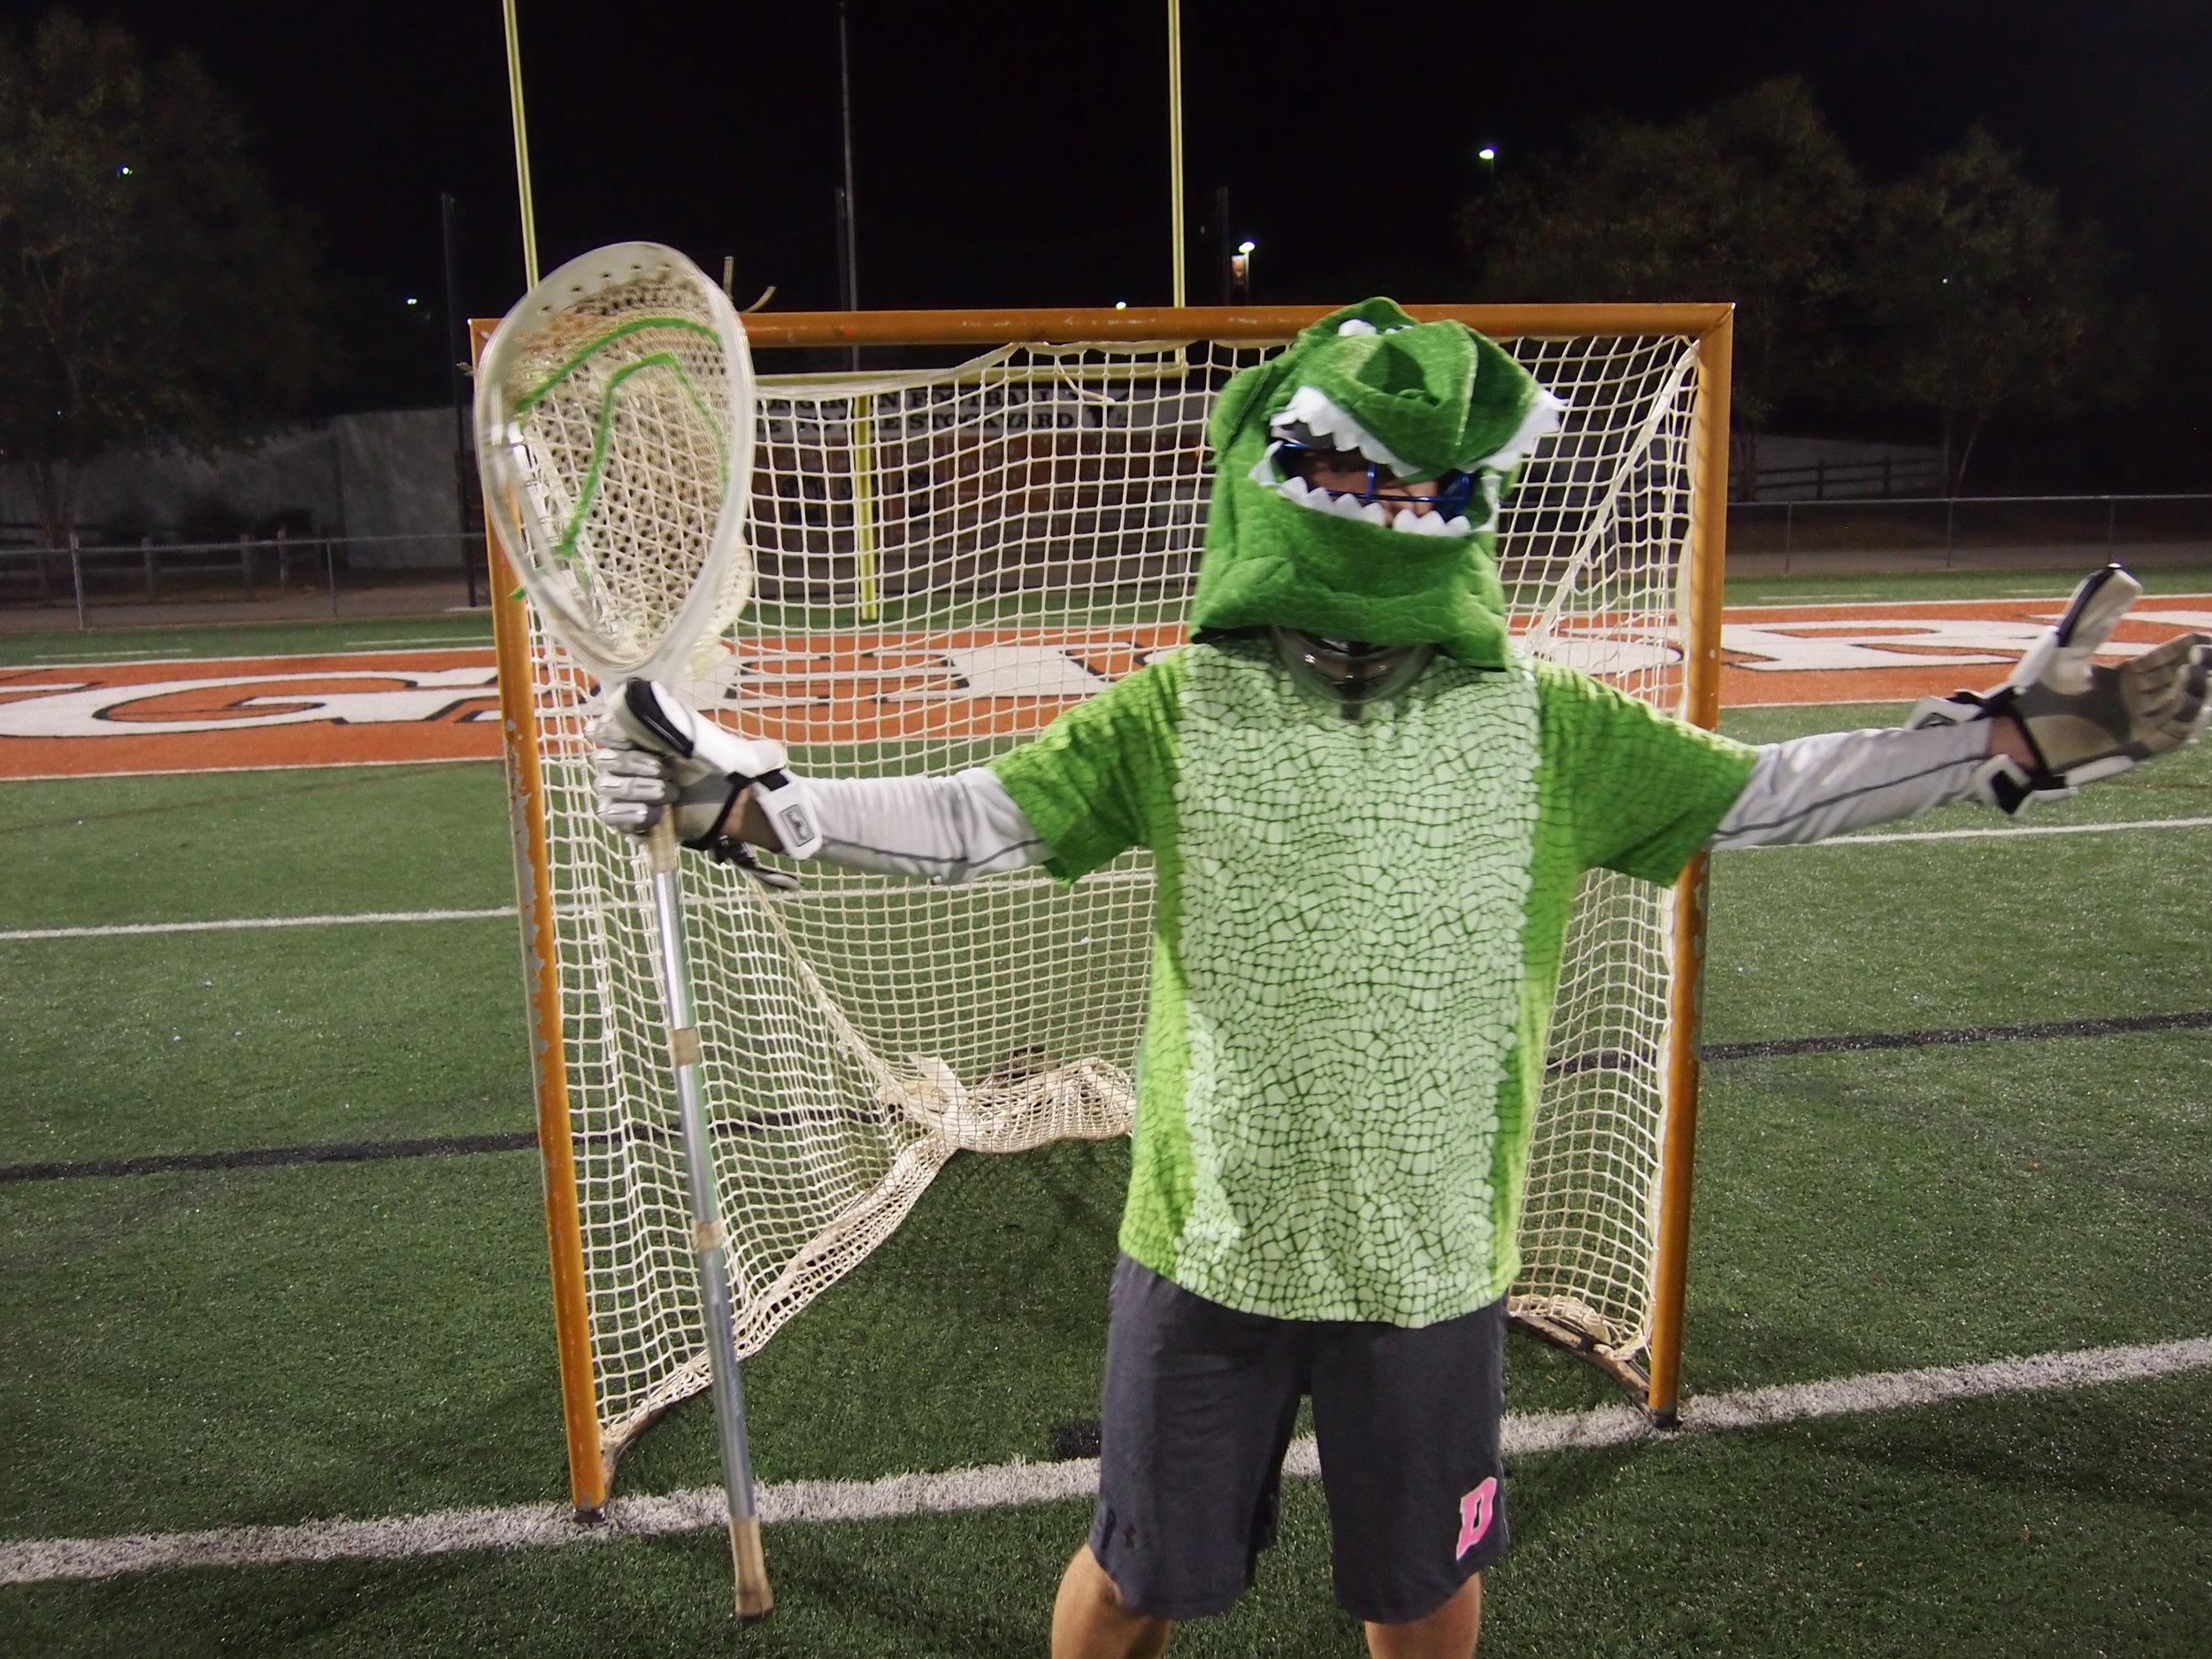 Keeper Crocodile a/k/a Alex Crawford